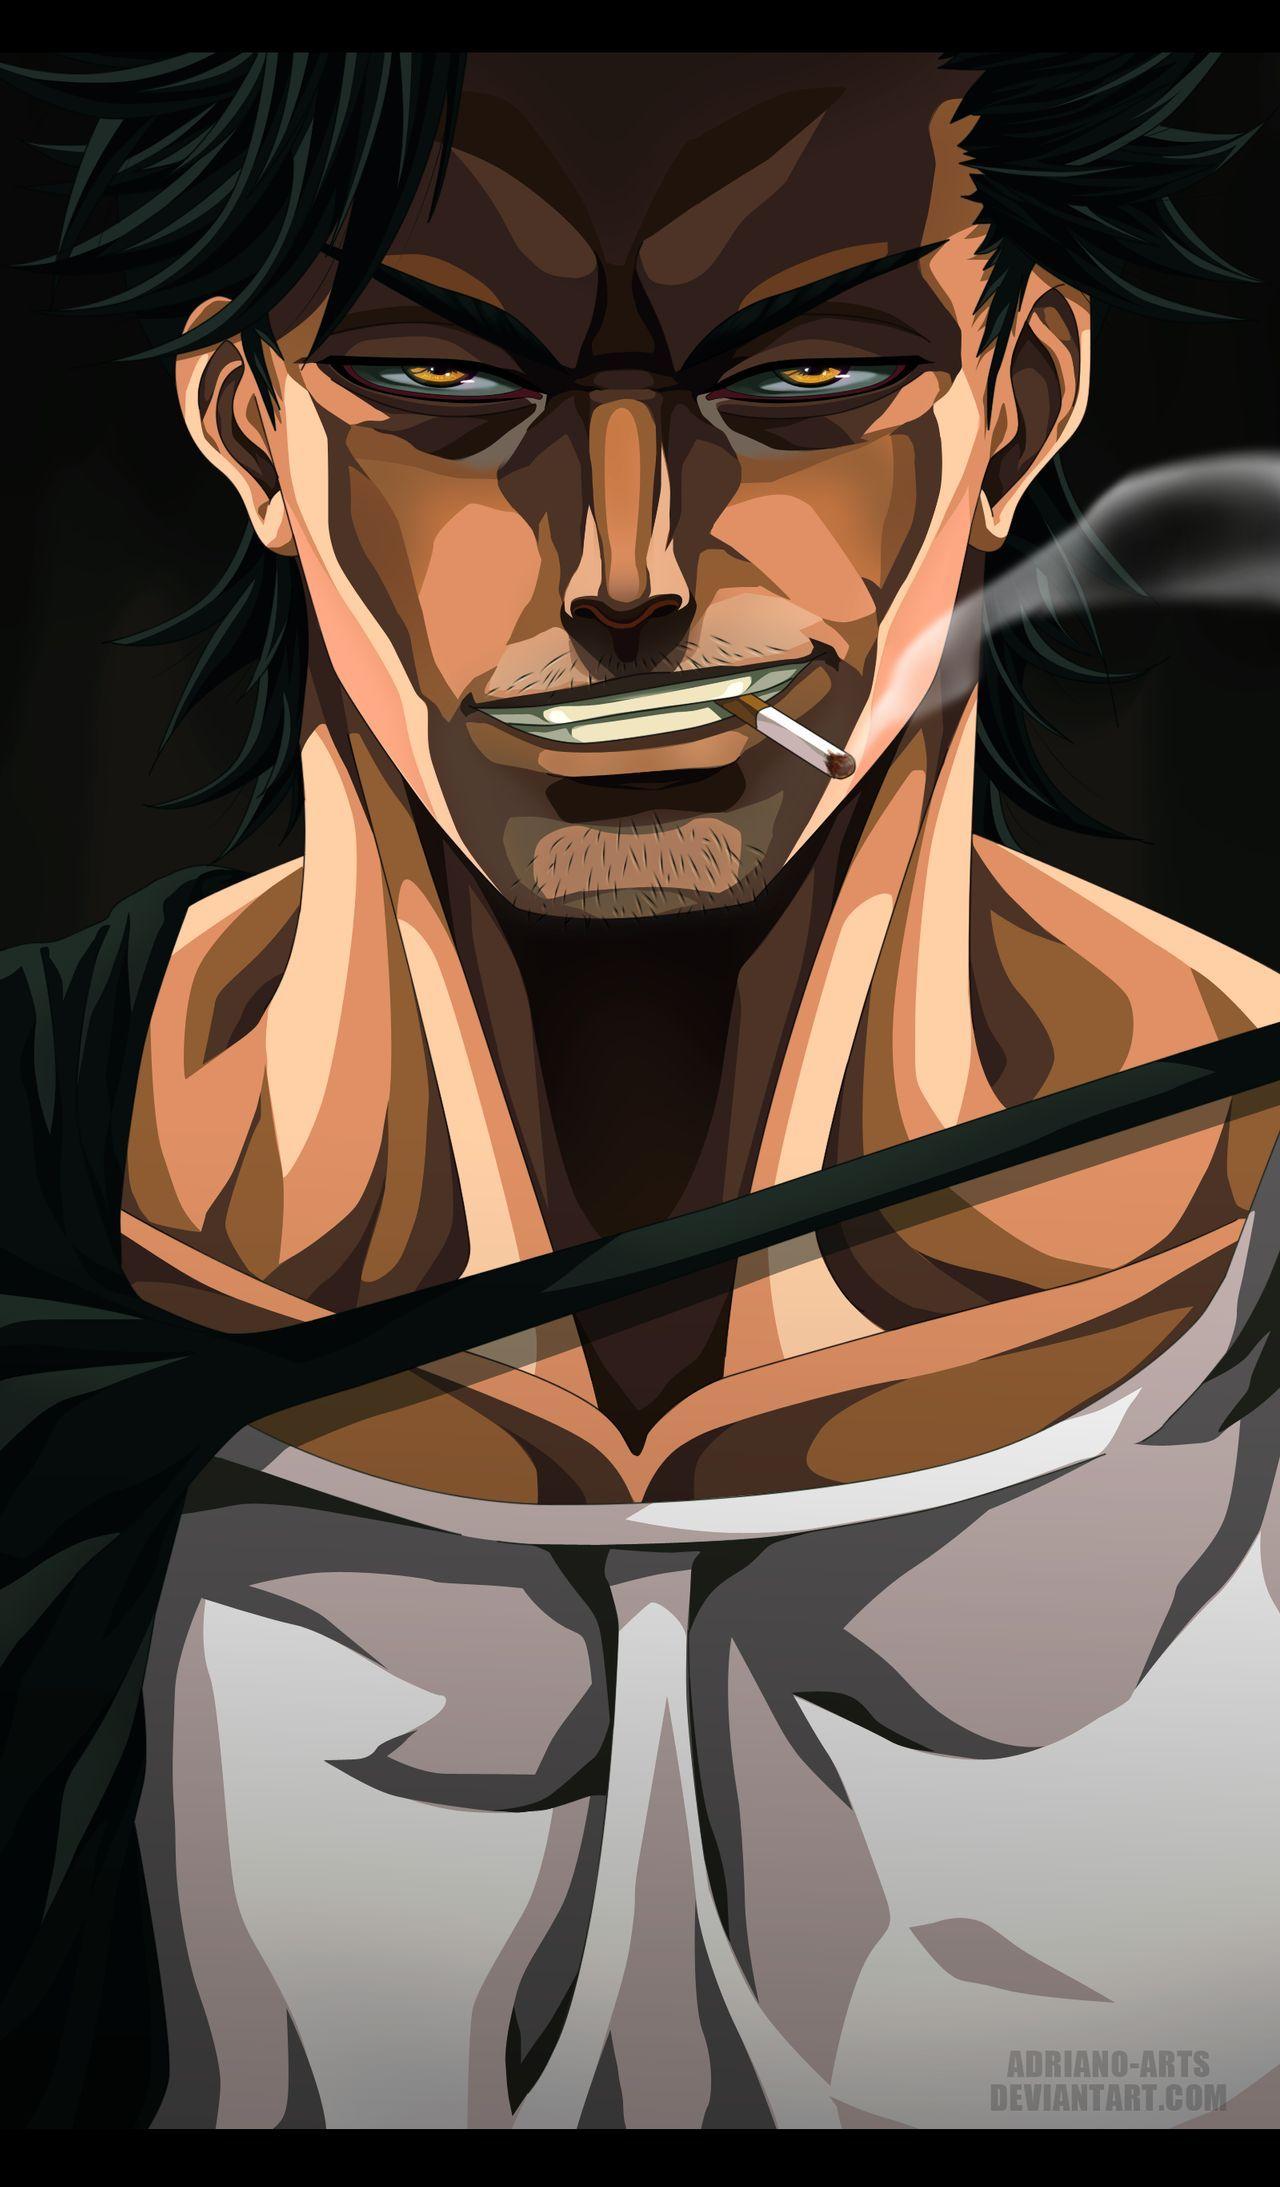 Yami Wallpaper : wallpaper, Yami-Sukehiro, Adriano-Arts, DeviantArt, Black, Clover, Manga,, Anime,